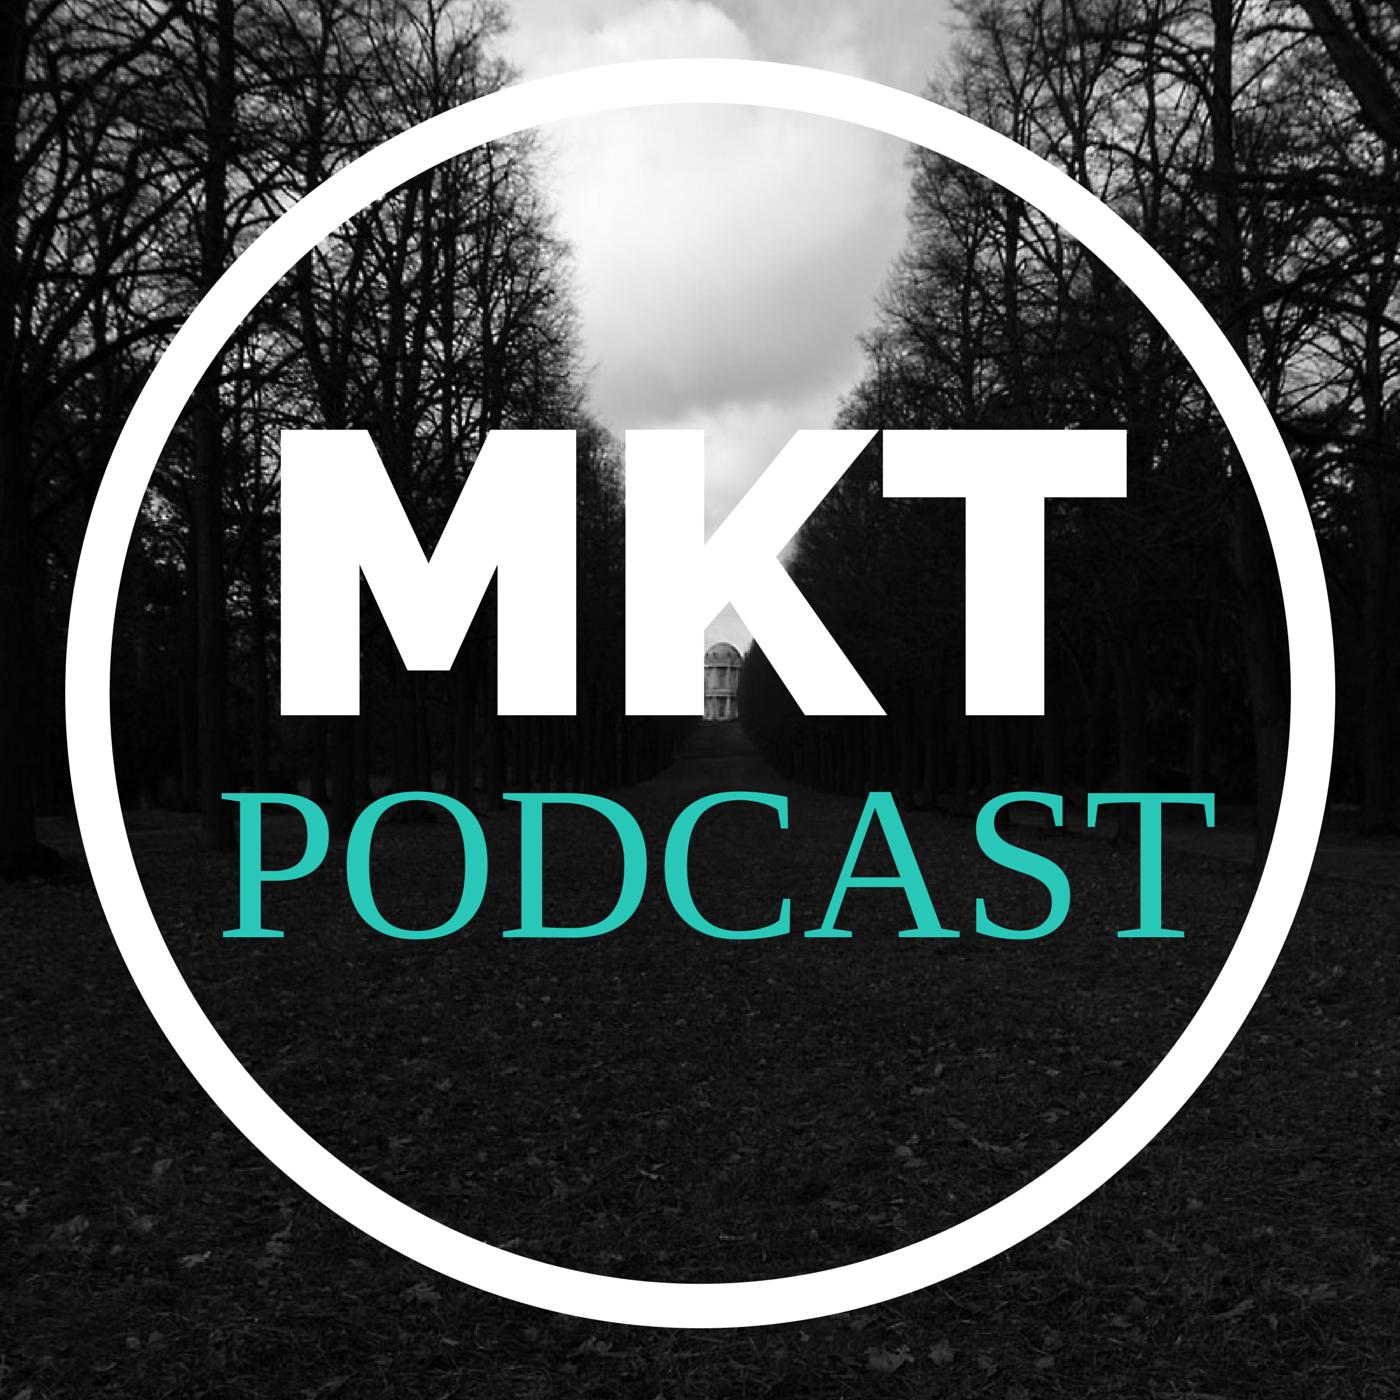 mktpodcast's podcast show art